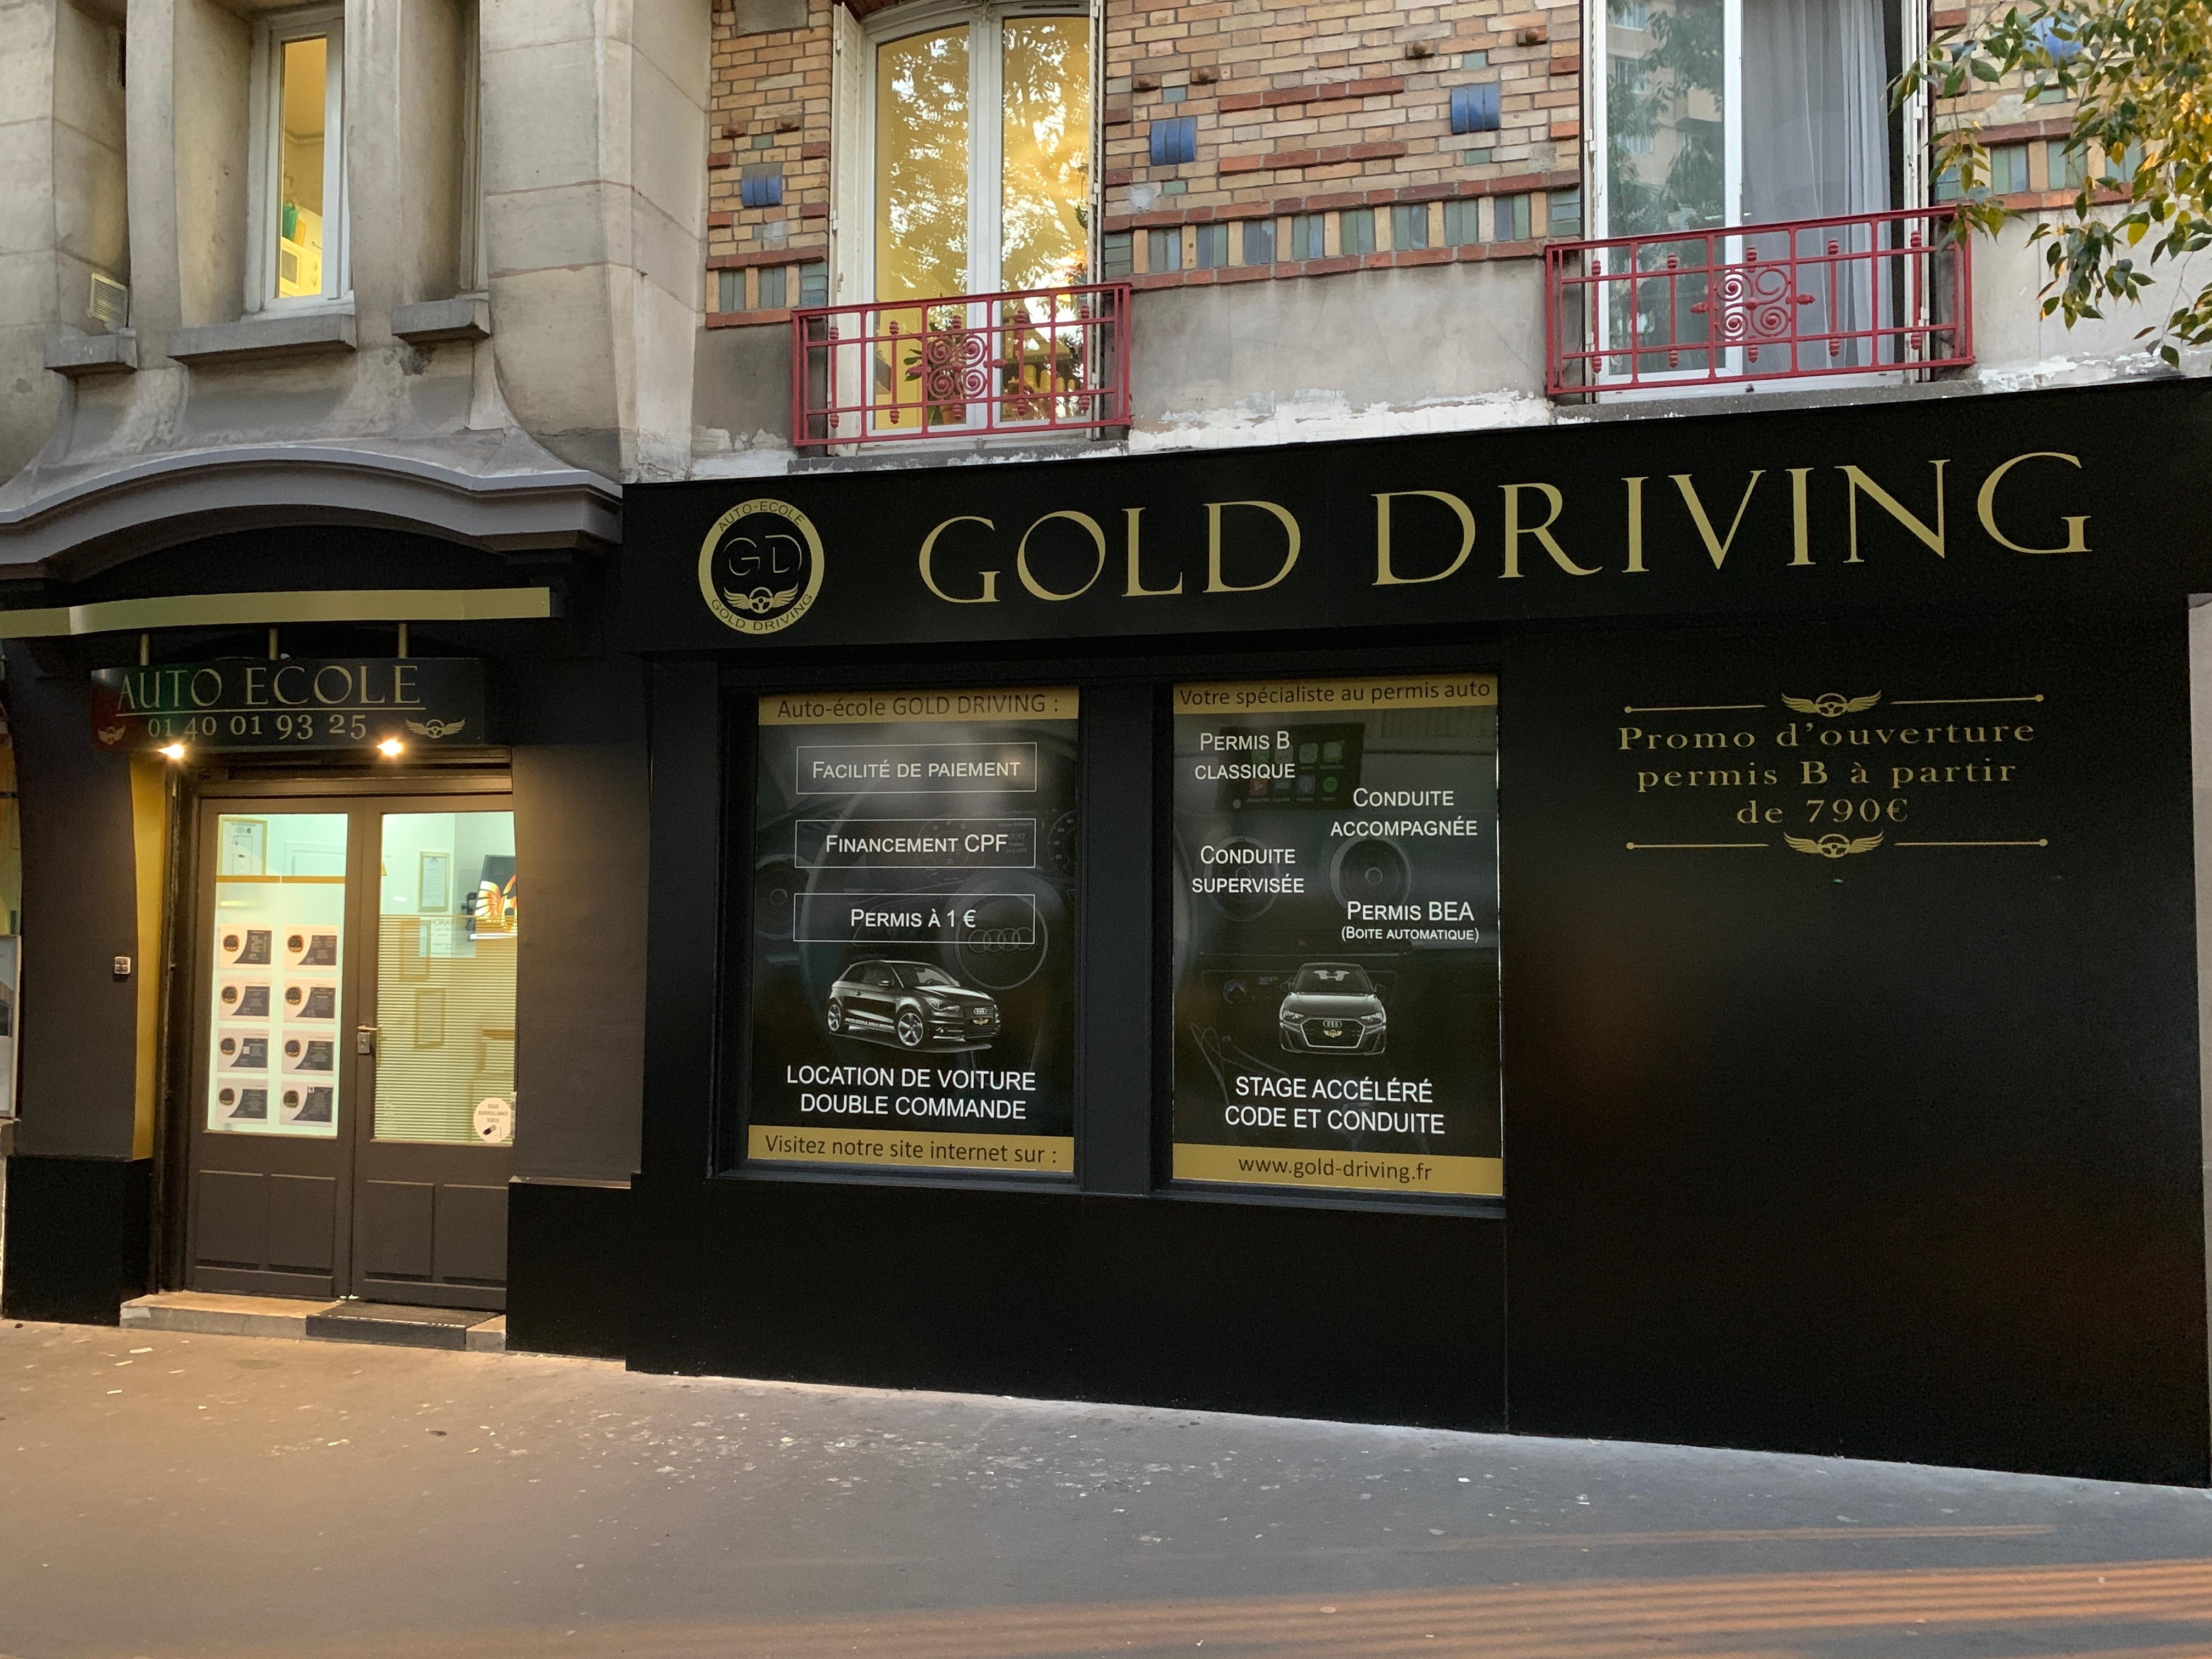 Façade exterieure 2 de GOLD DRIVING